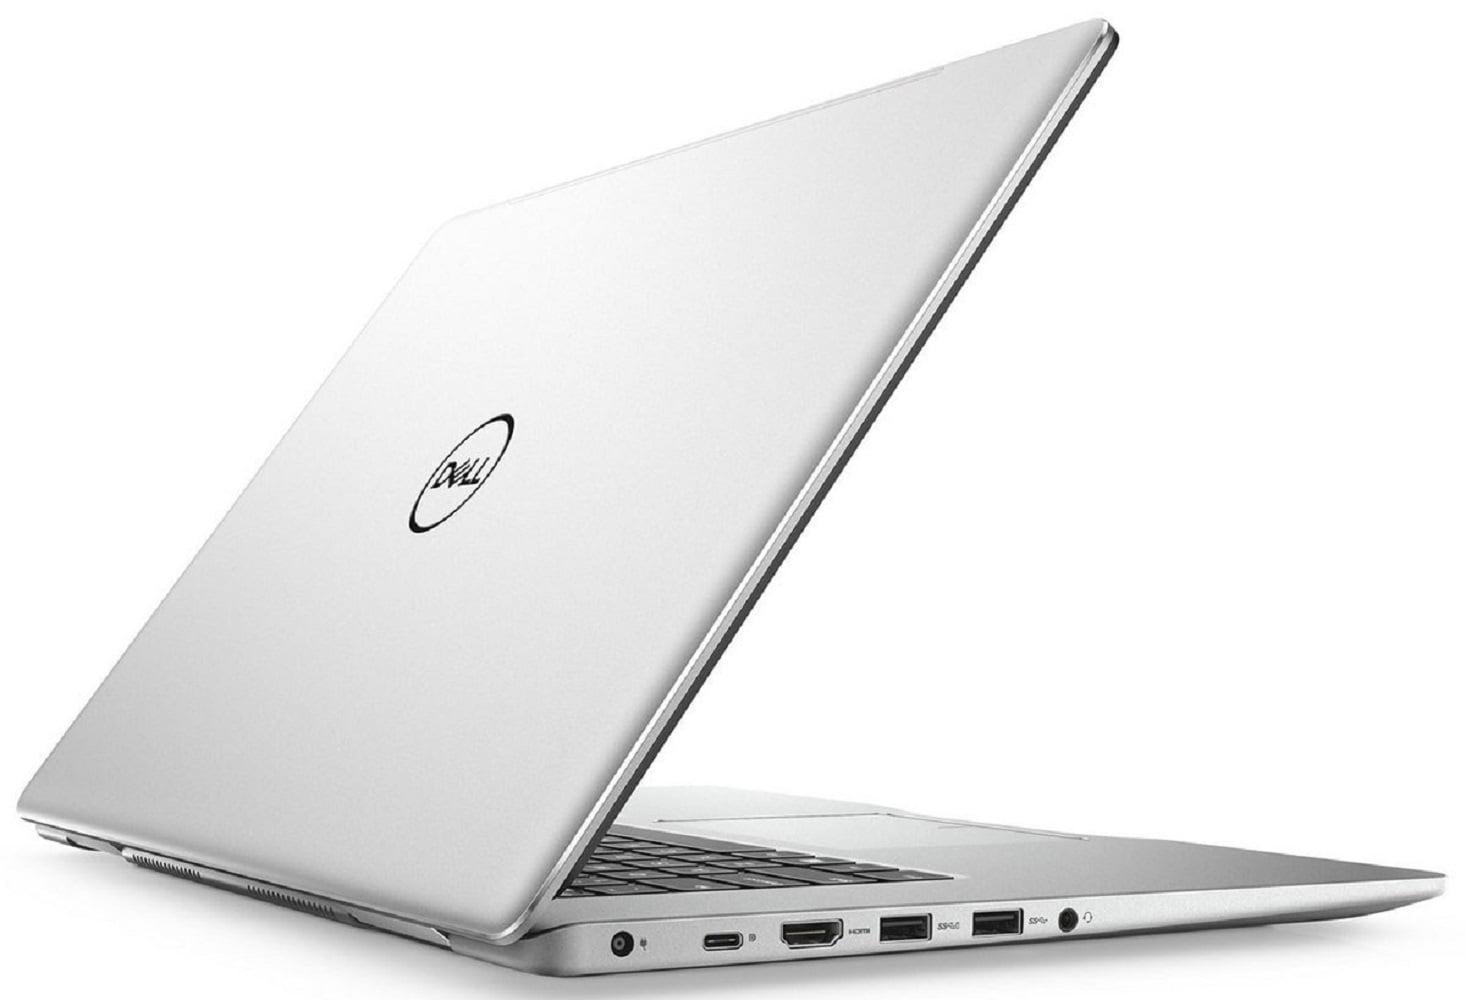 Dell Inspiron 15 7000 Laptop, i7570-7224SLV, 15 6'' FHD, Intel Core  i7-8550U, 8GB 2400MHz DDR4, 1 TB 5400 RPM Hybrid, NVIDIA GeForce MX130,  Windows 10